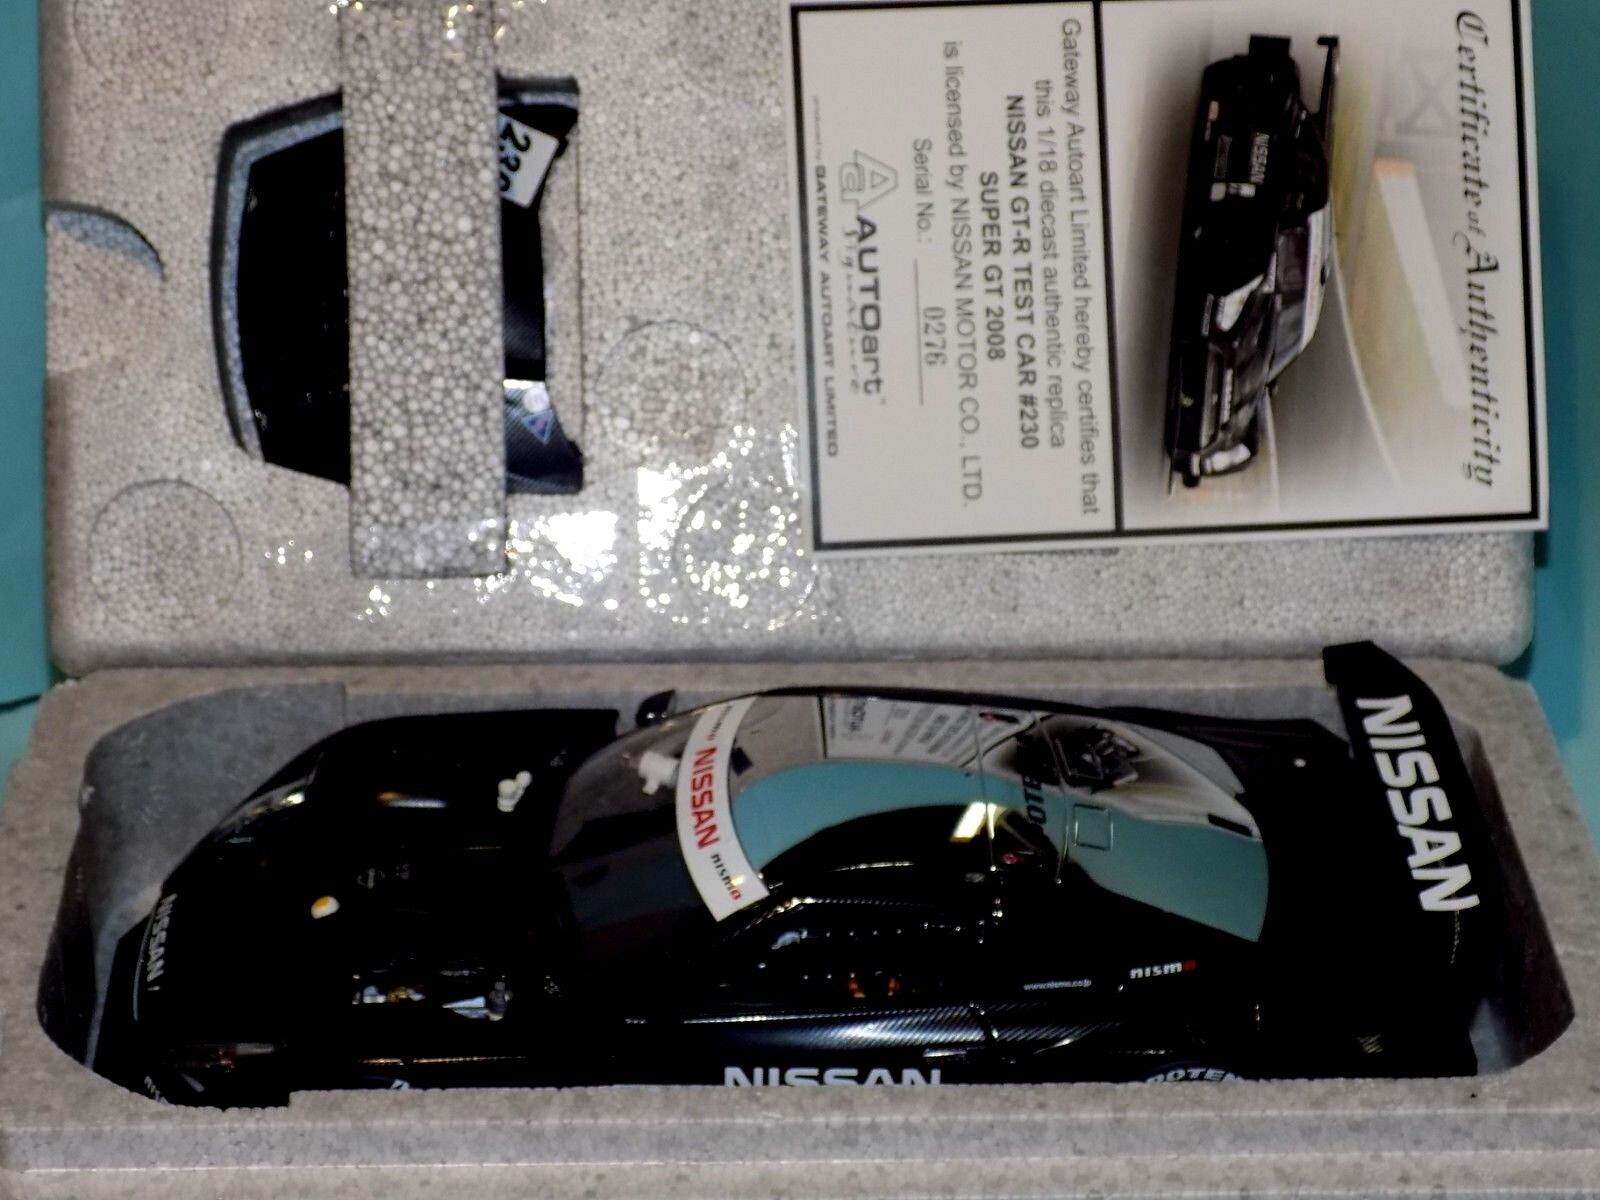 NISSAN  GT-R  SUPER GT 2008 TEST CAR AUTOART 80878 1 18